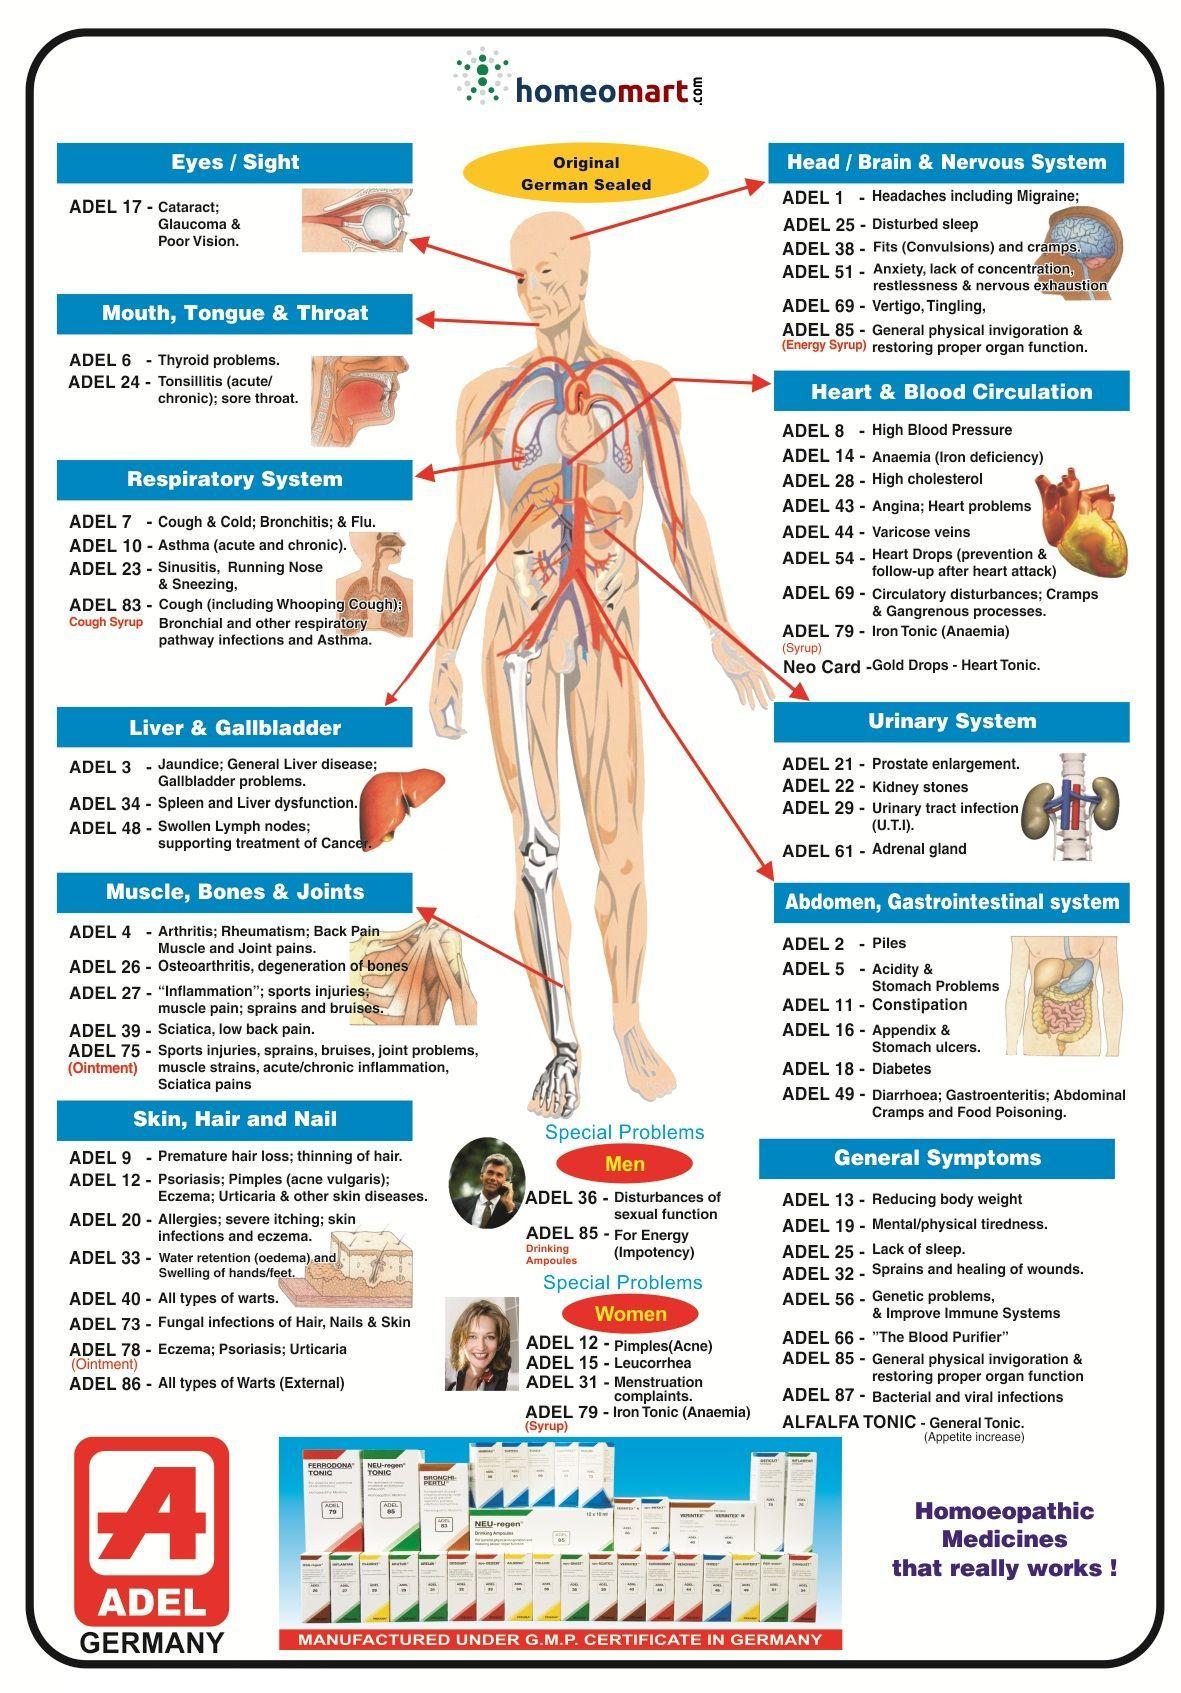 Adel Germany homeopathy medicine list, buy online get upto